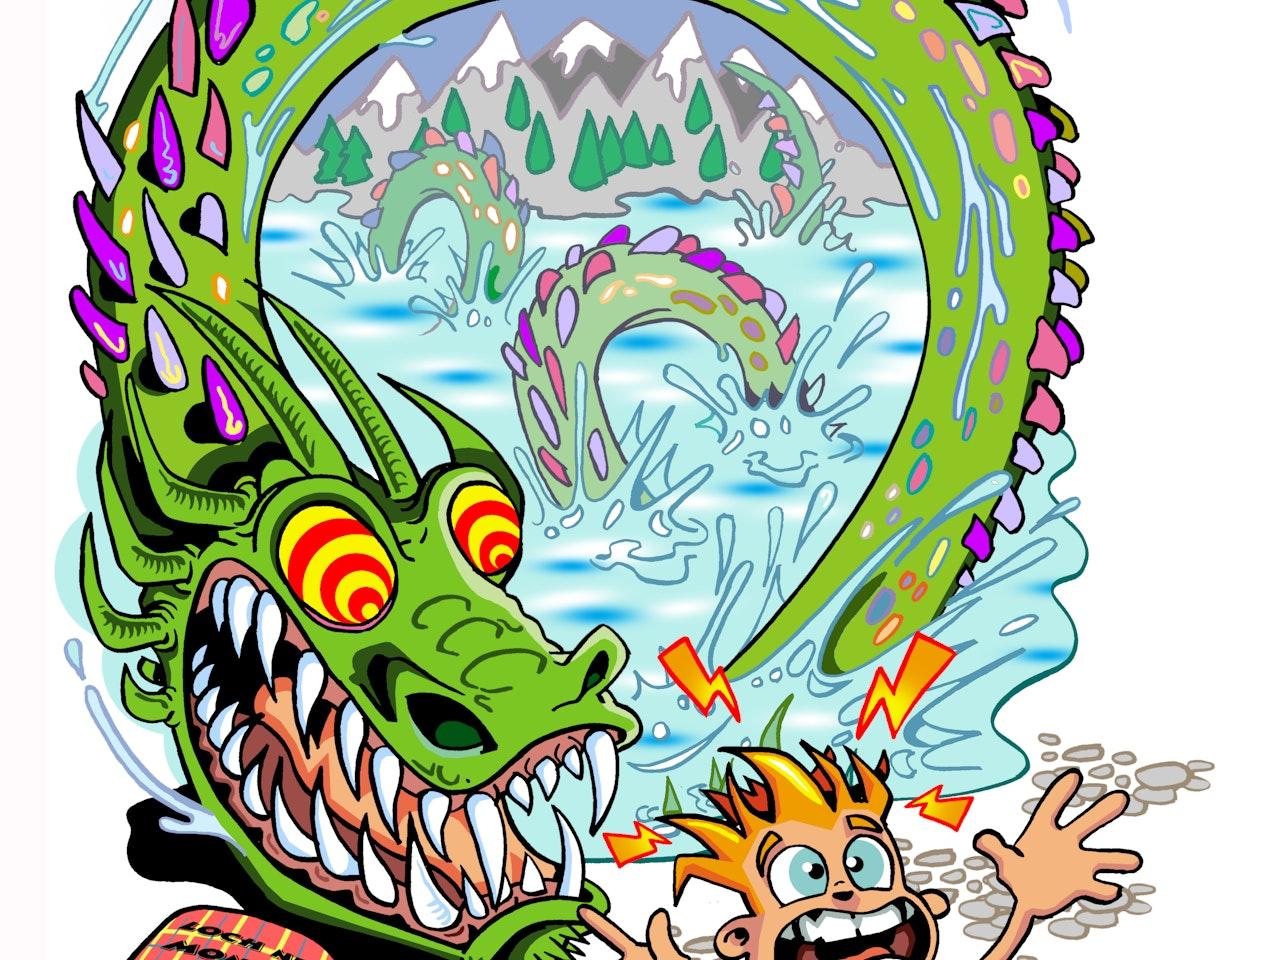 loch ness monster serpent snake myth legend scottish funny Funky Happy manga anime childrens cartoon comic strip Book cover illustration animation